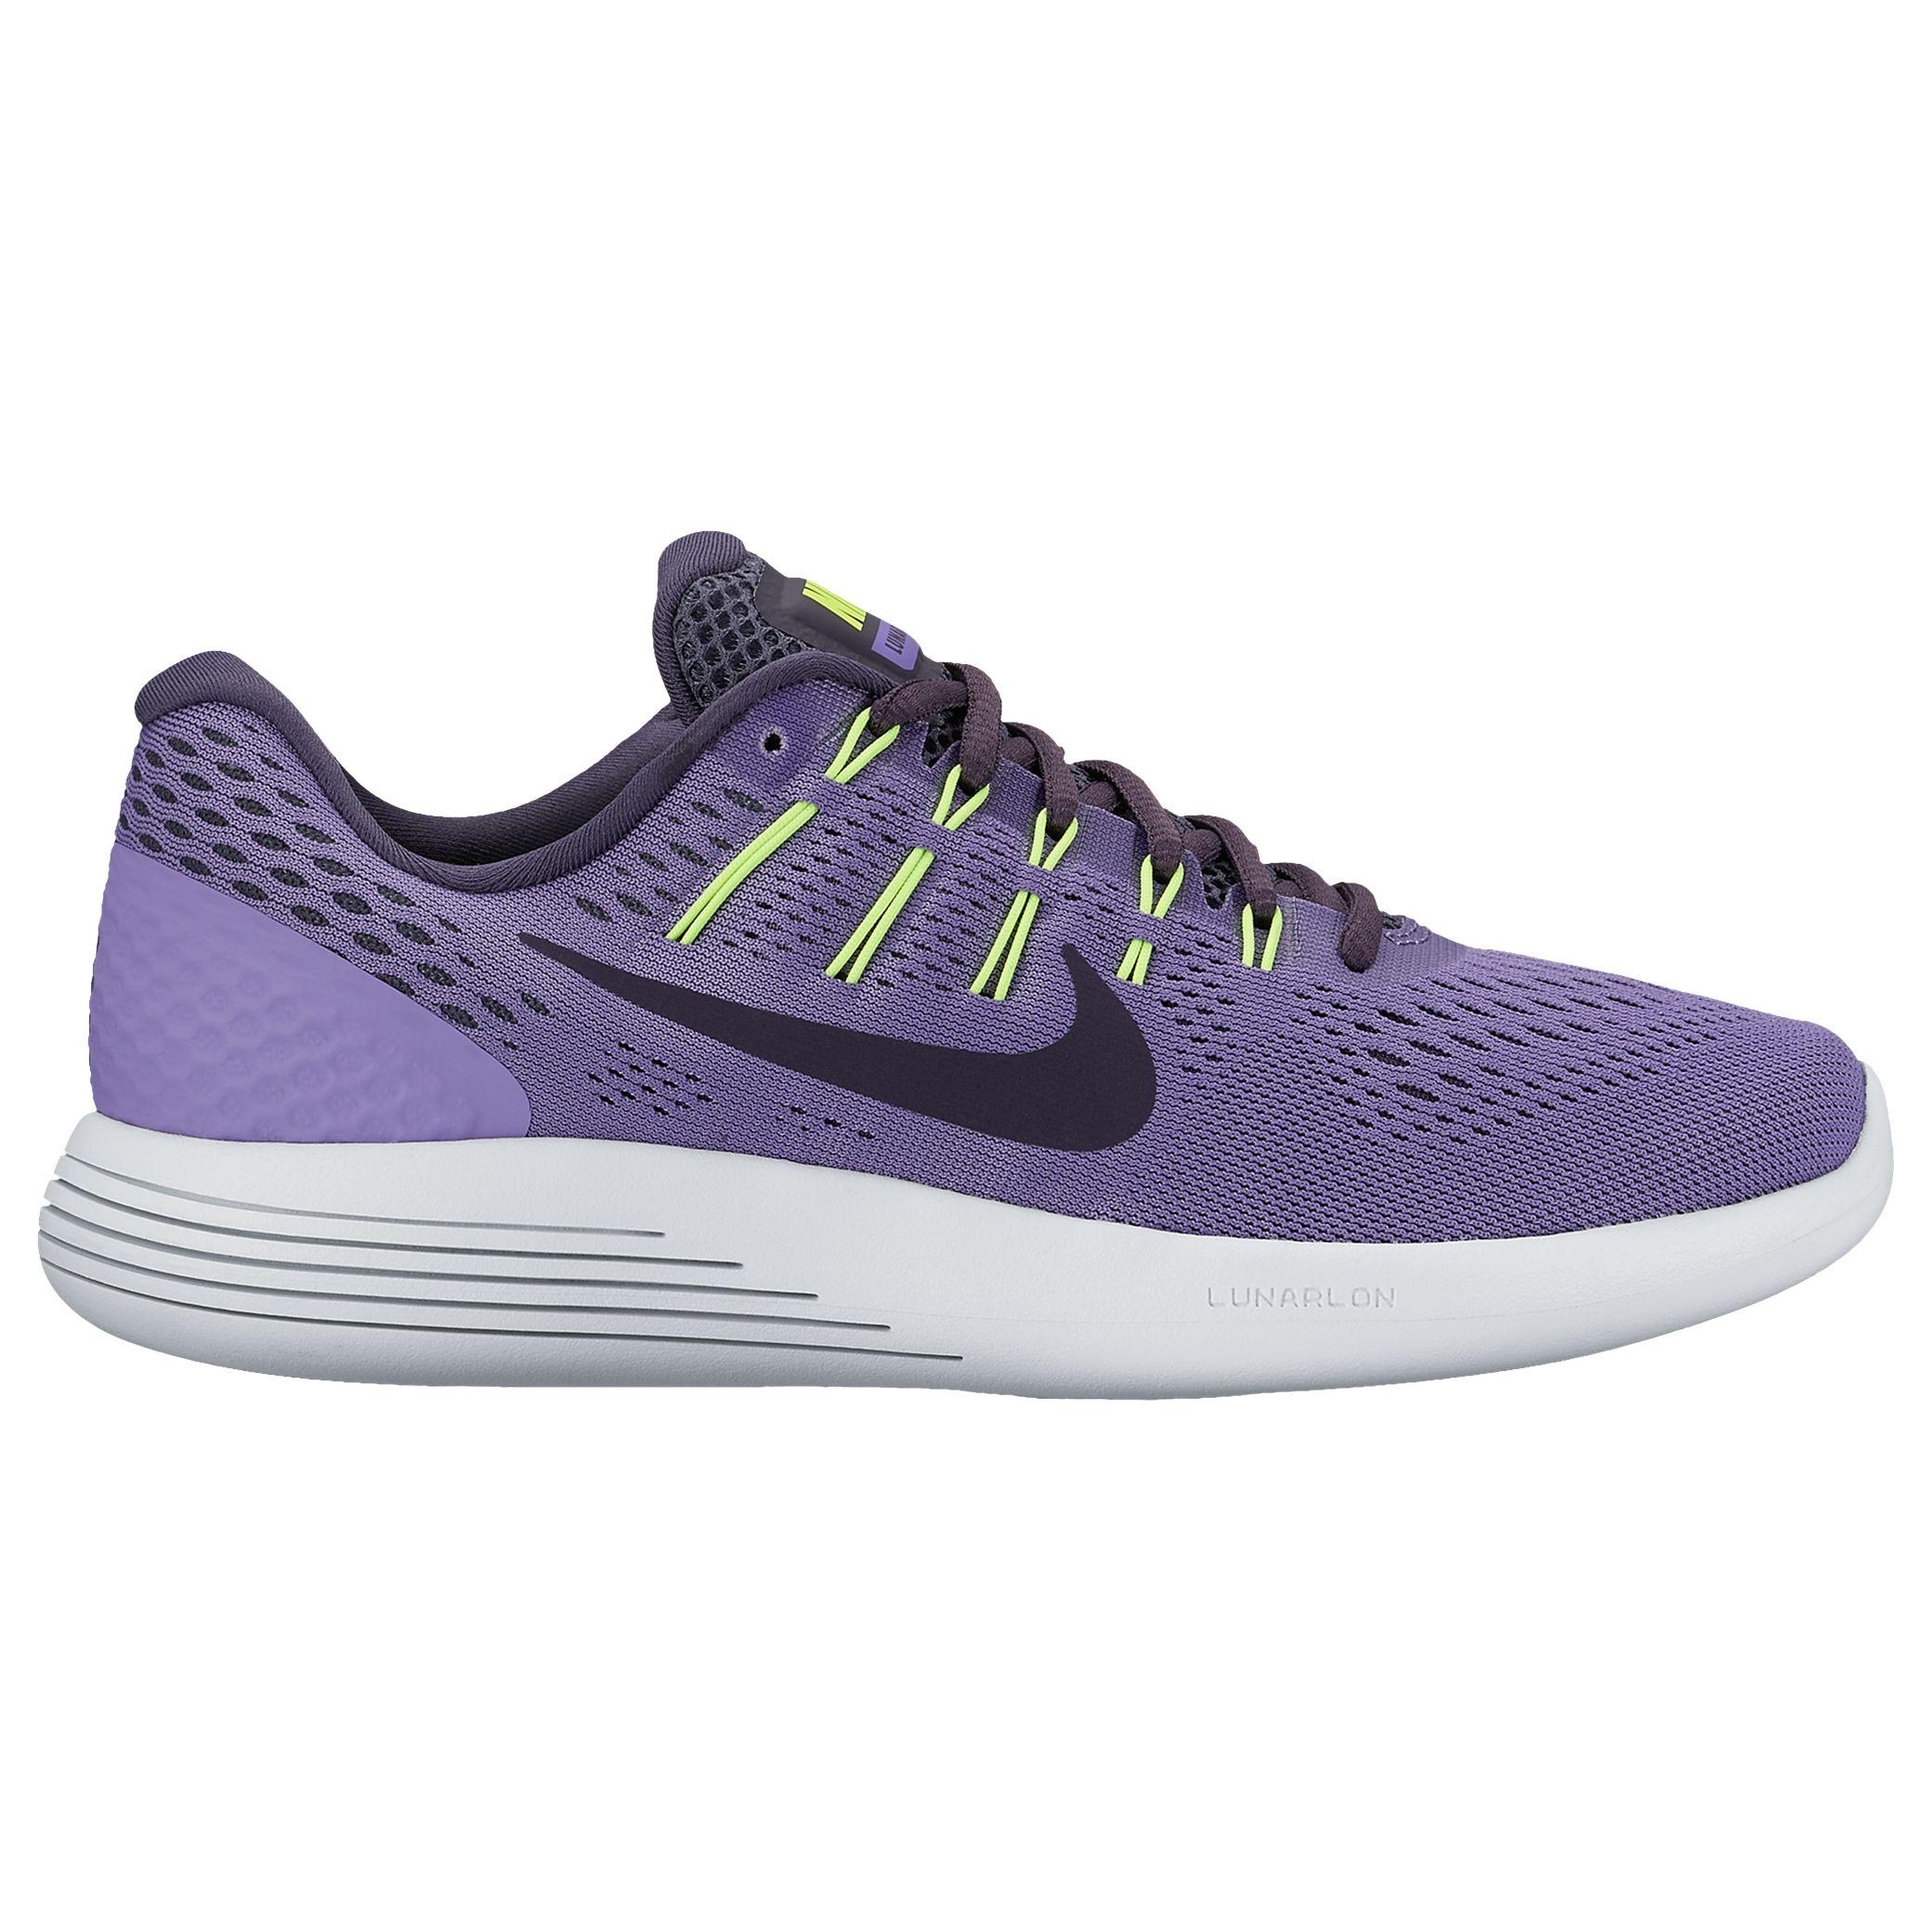 hot sale online 472f3 8b9cb Nike LunarGlide 8 Women s Running Shoes at John Lewis   Partners